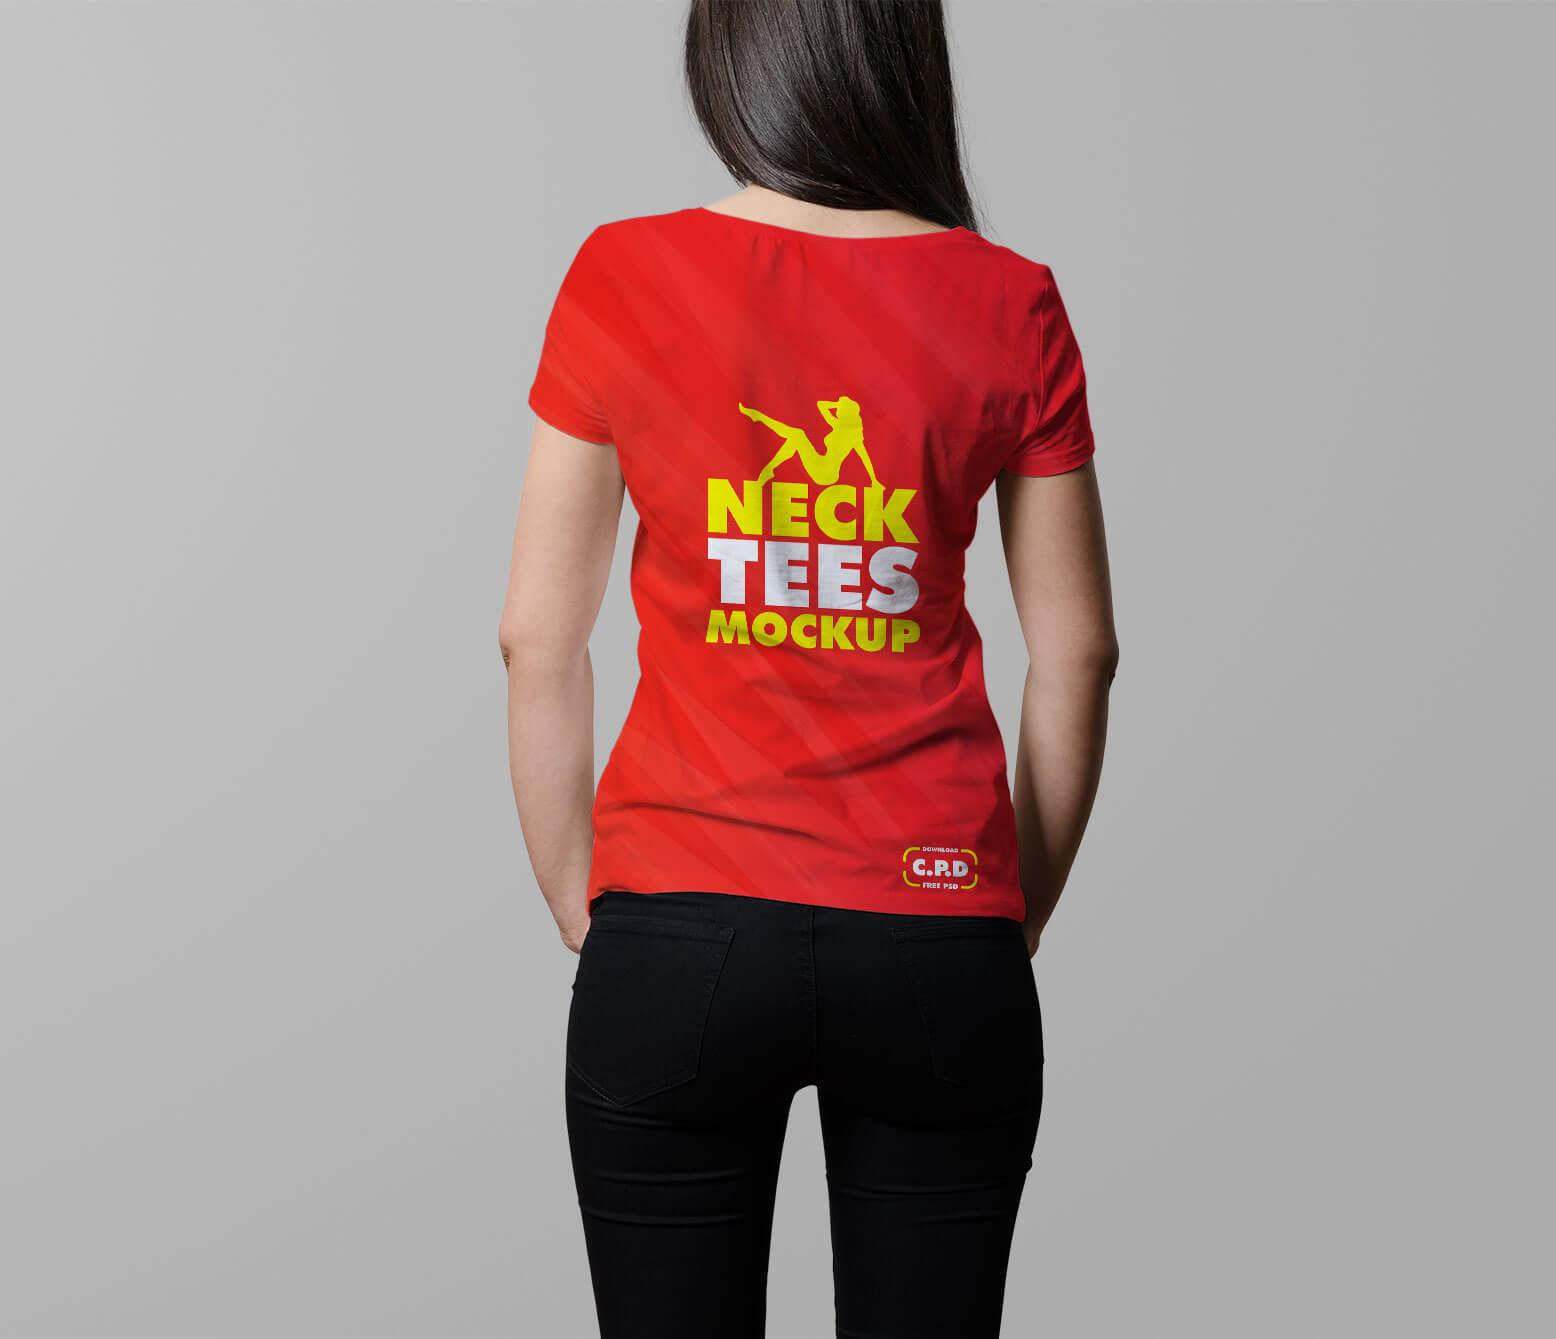 V Neck Female T Shirt Mockup Free Psd Free Apparel Mockups Pixelify Net